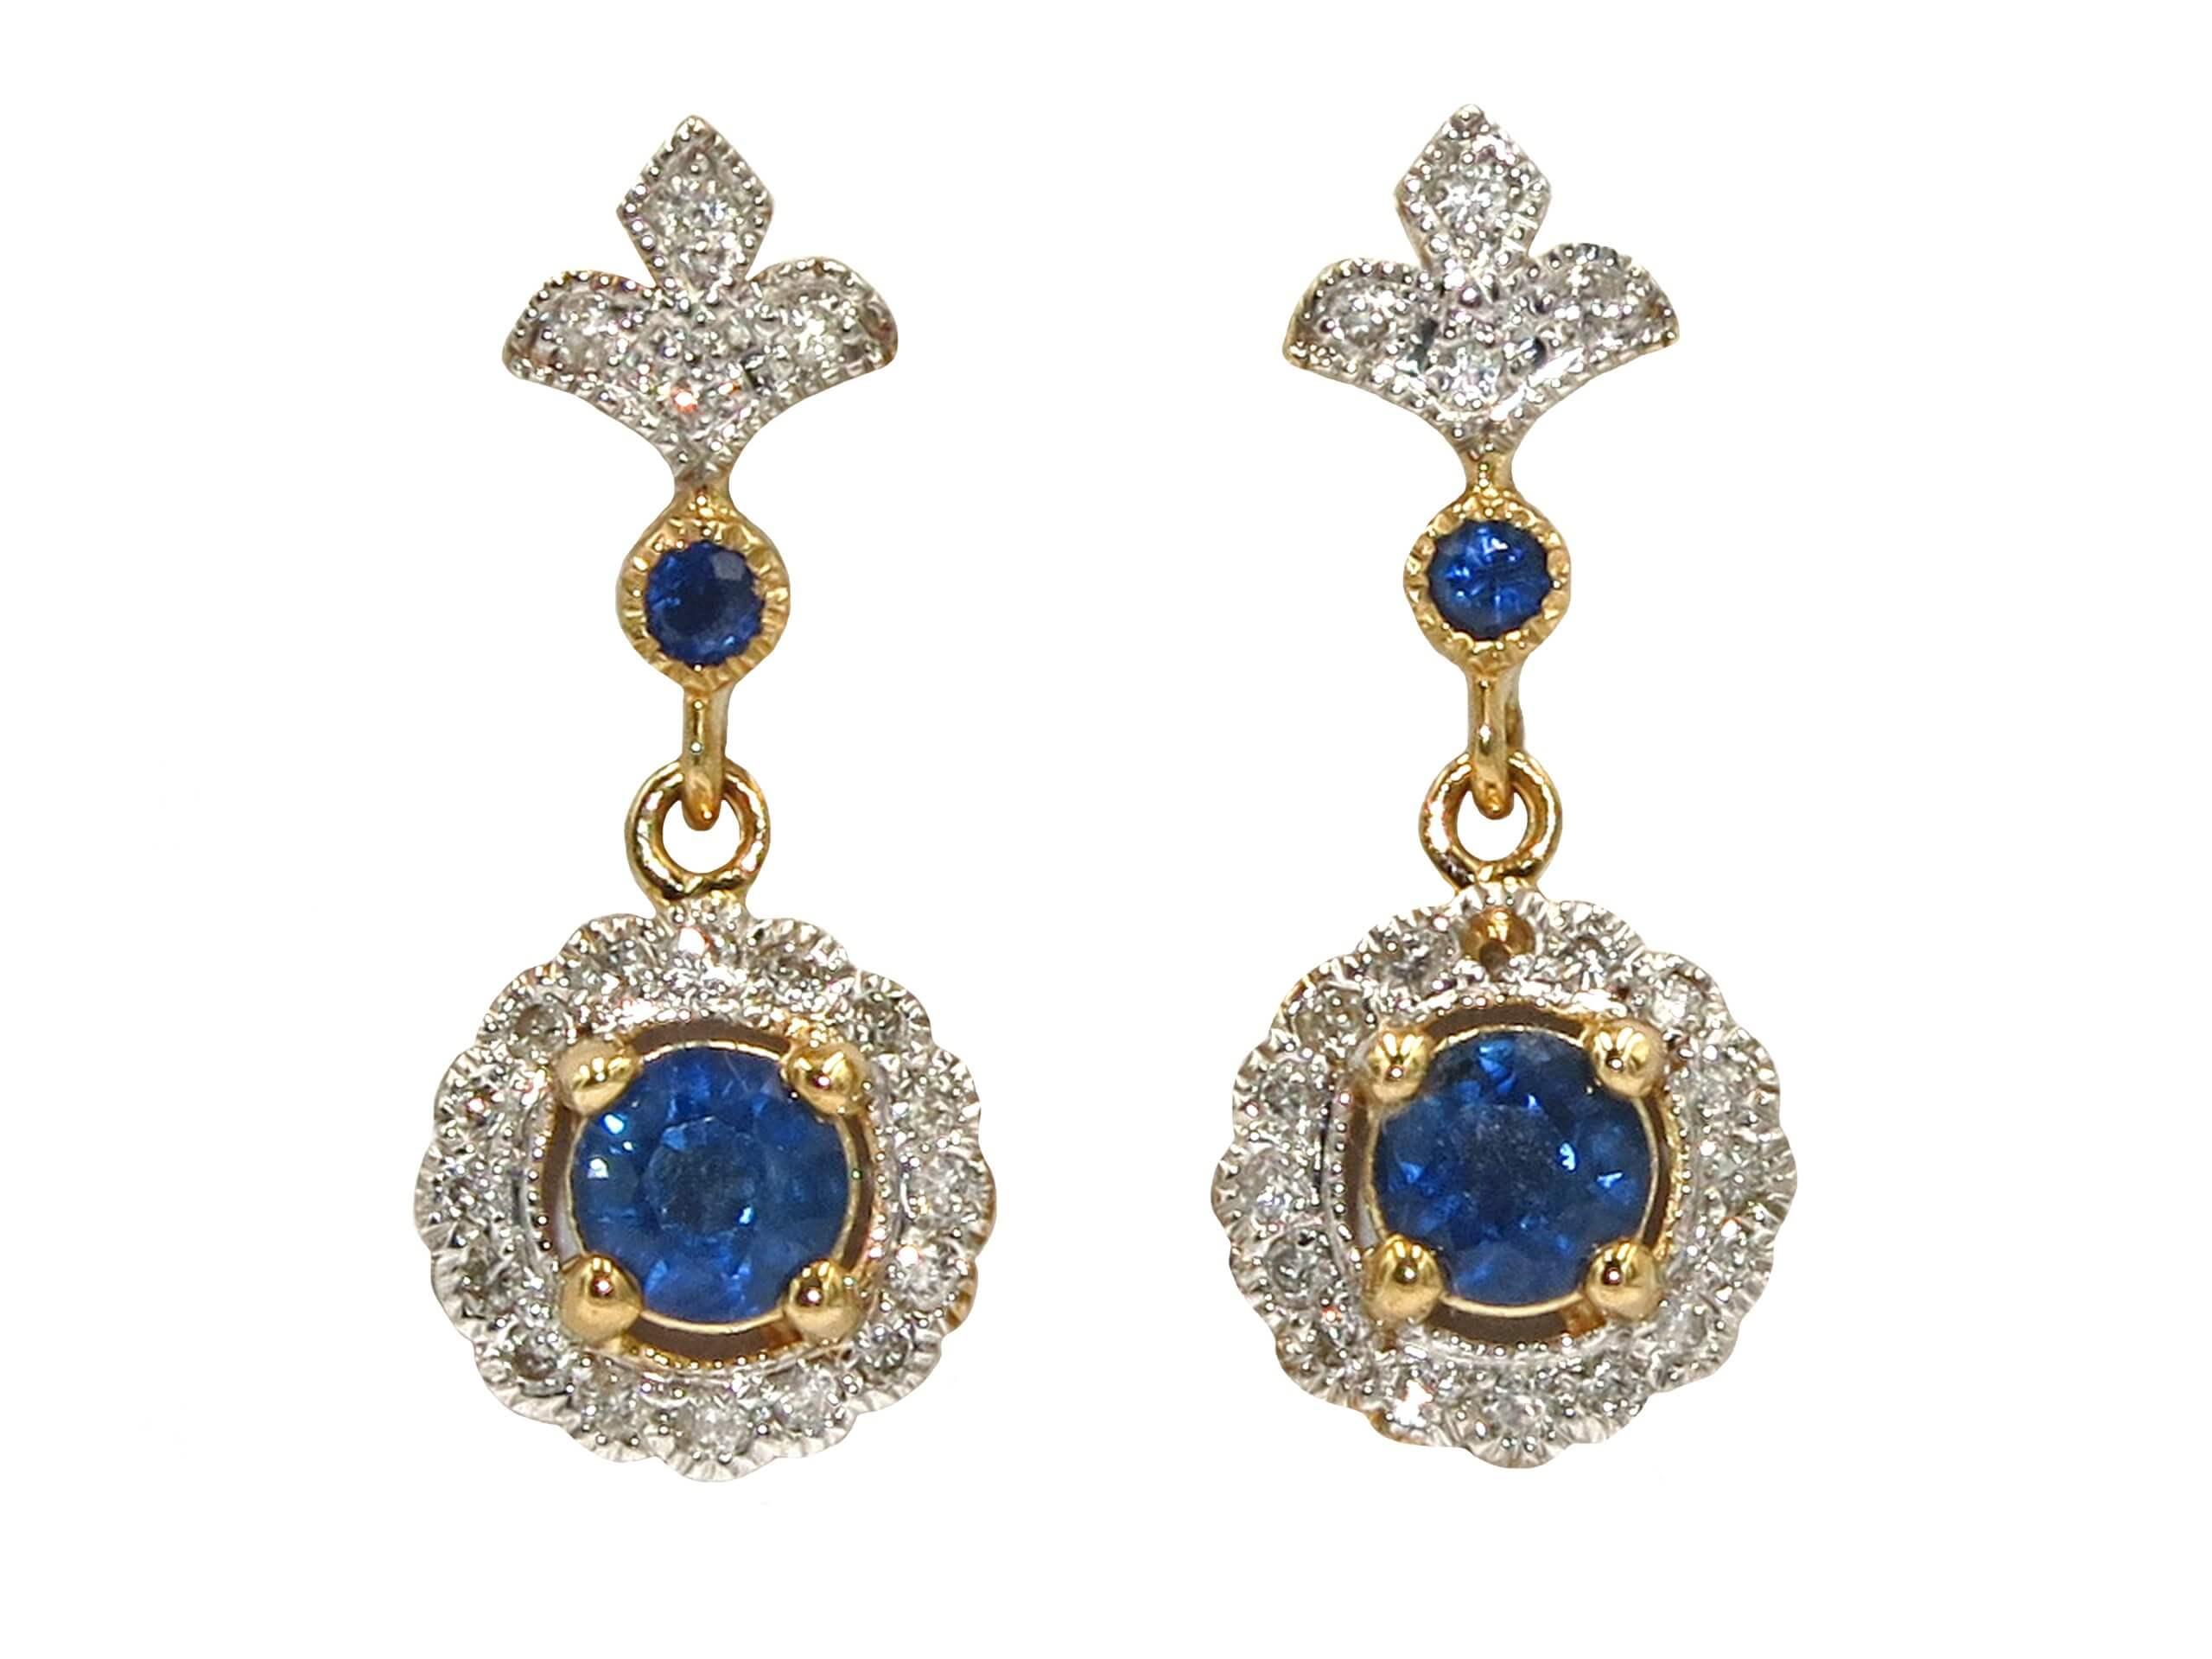 SAPPHIRE AND DIAMOND EARRINGS MJ24589